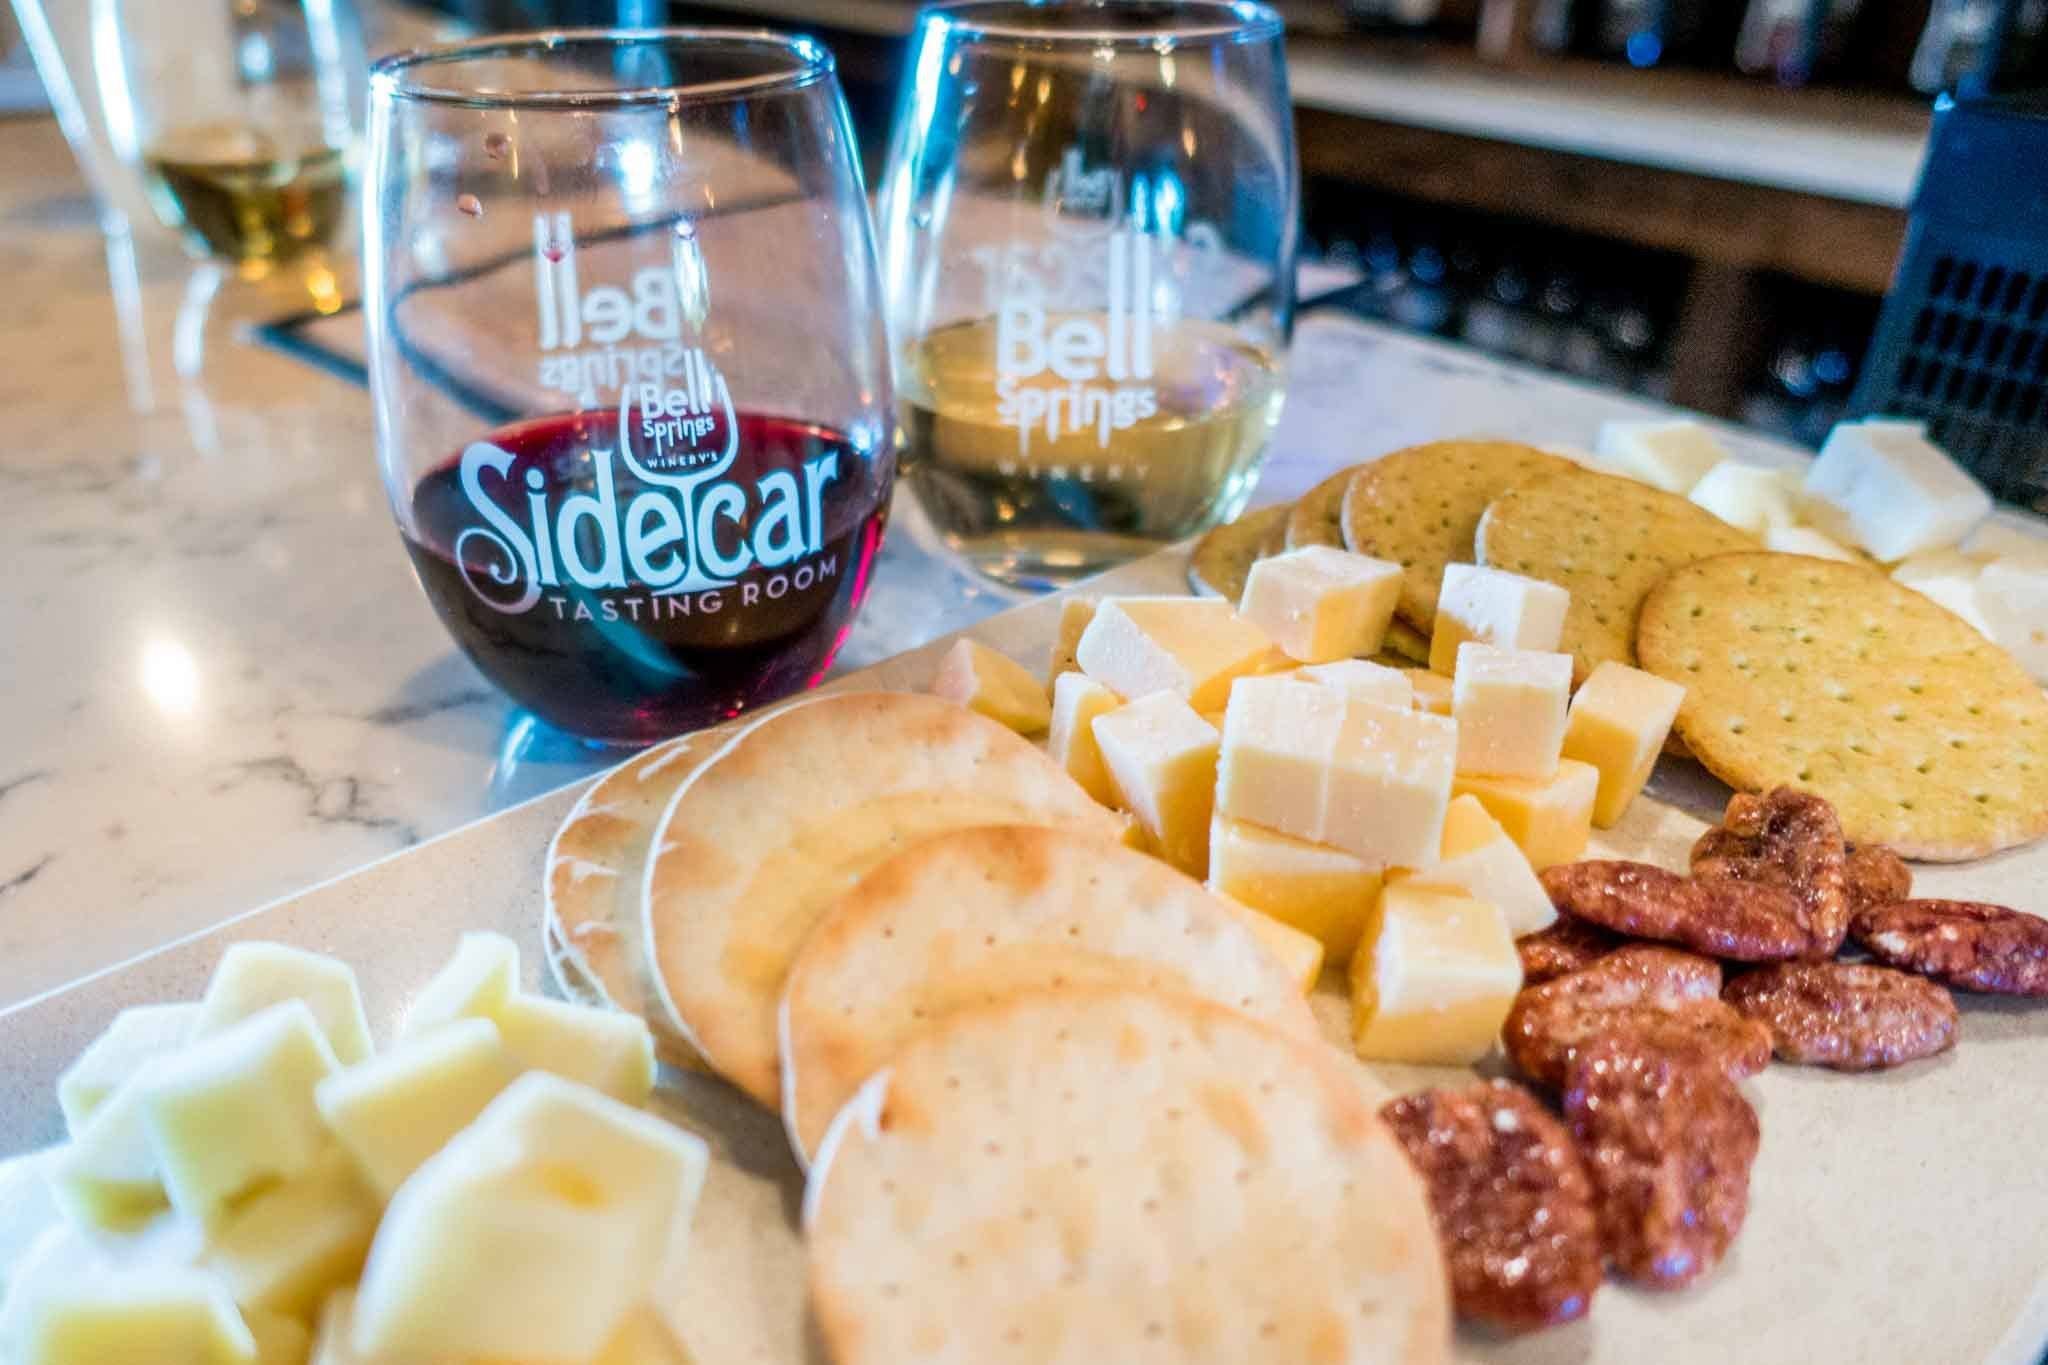 Wine glasses and snacks